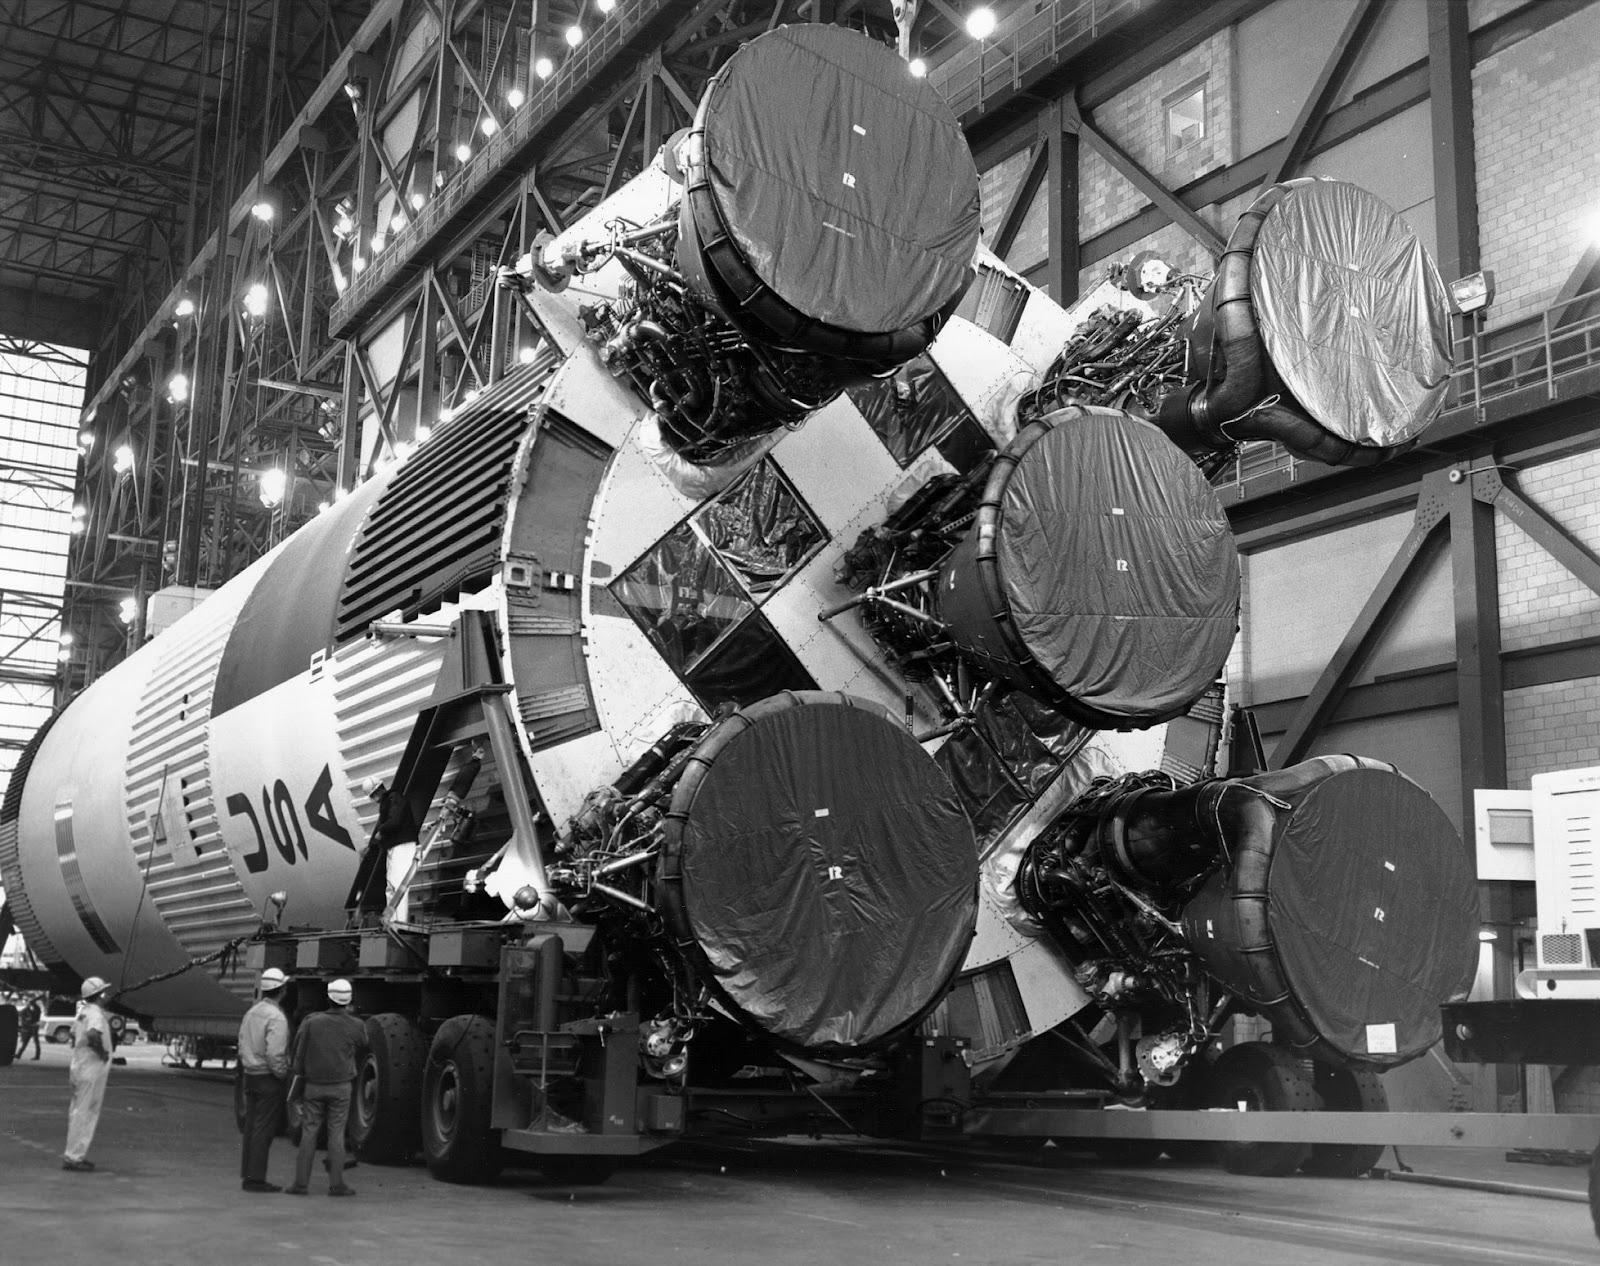 apollo spacecraft engine - photo #28